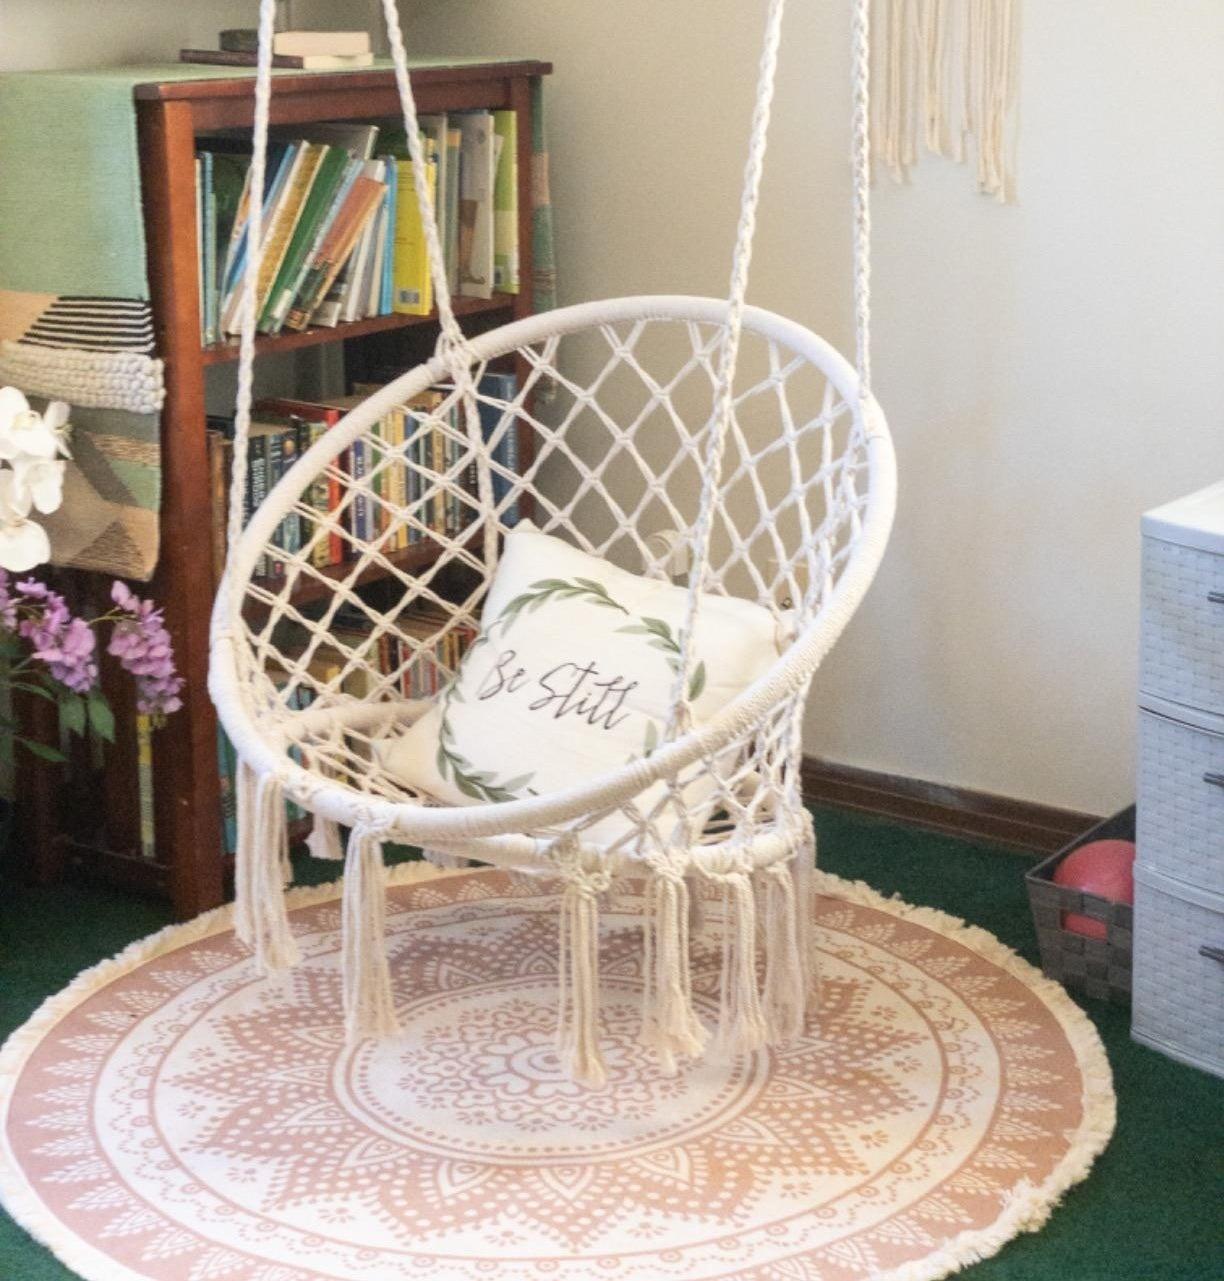 reviewer's white macrame hammock swing in their room